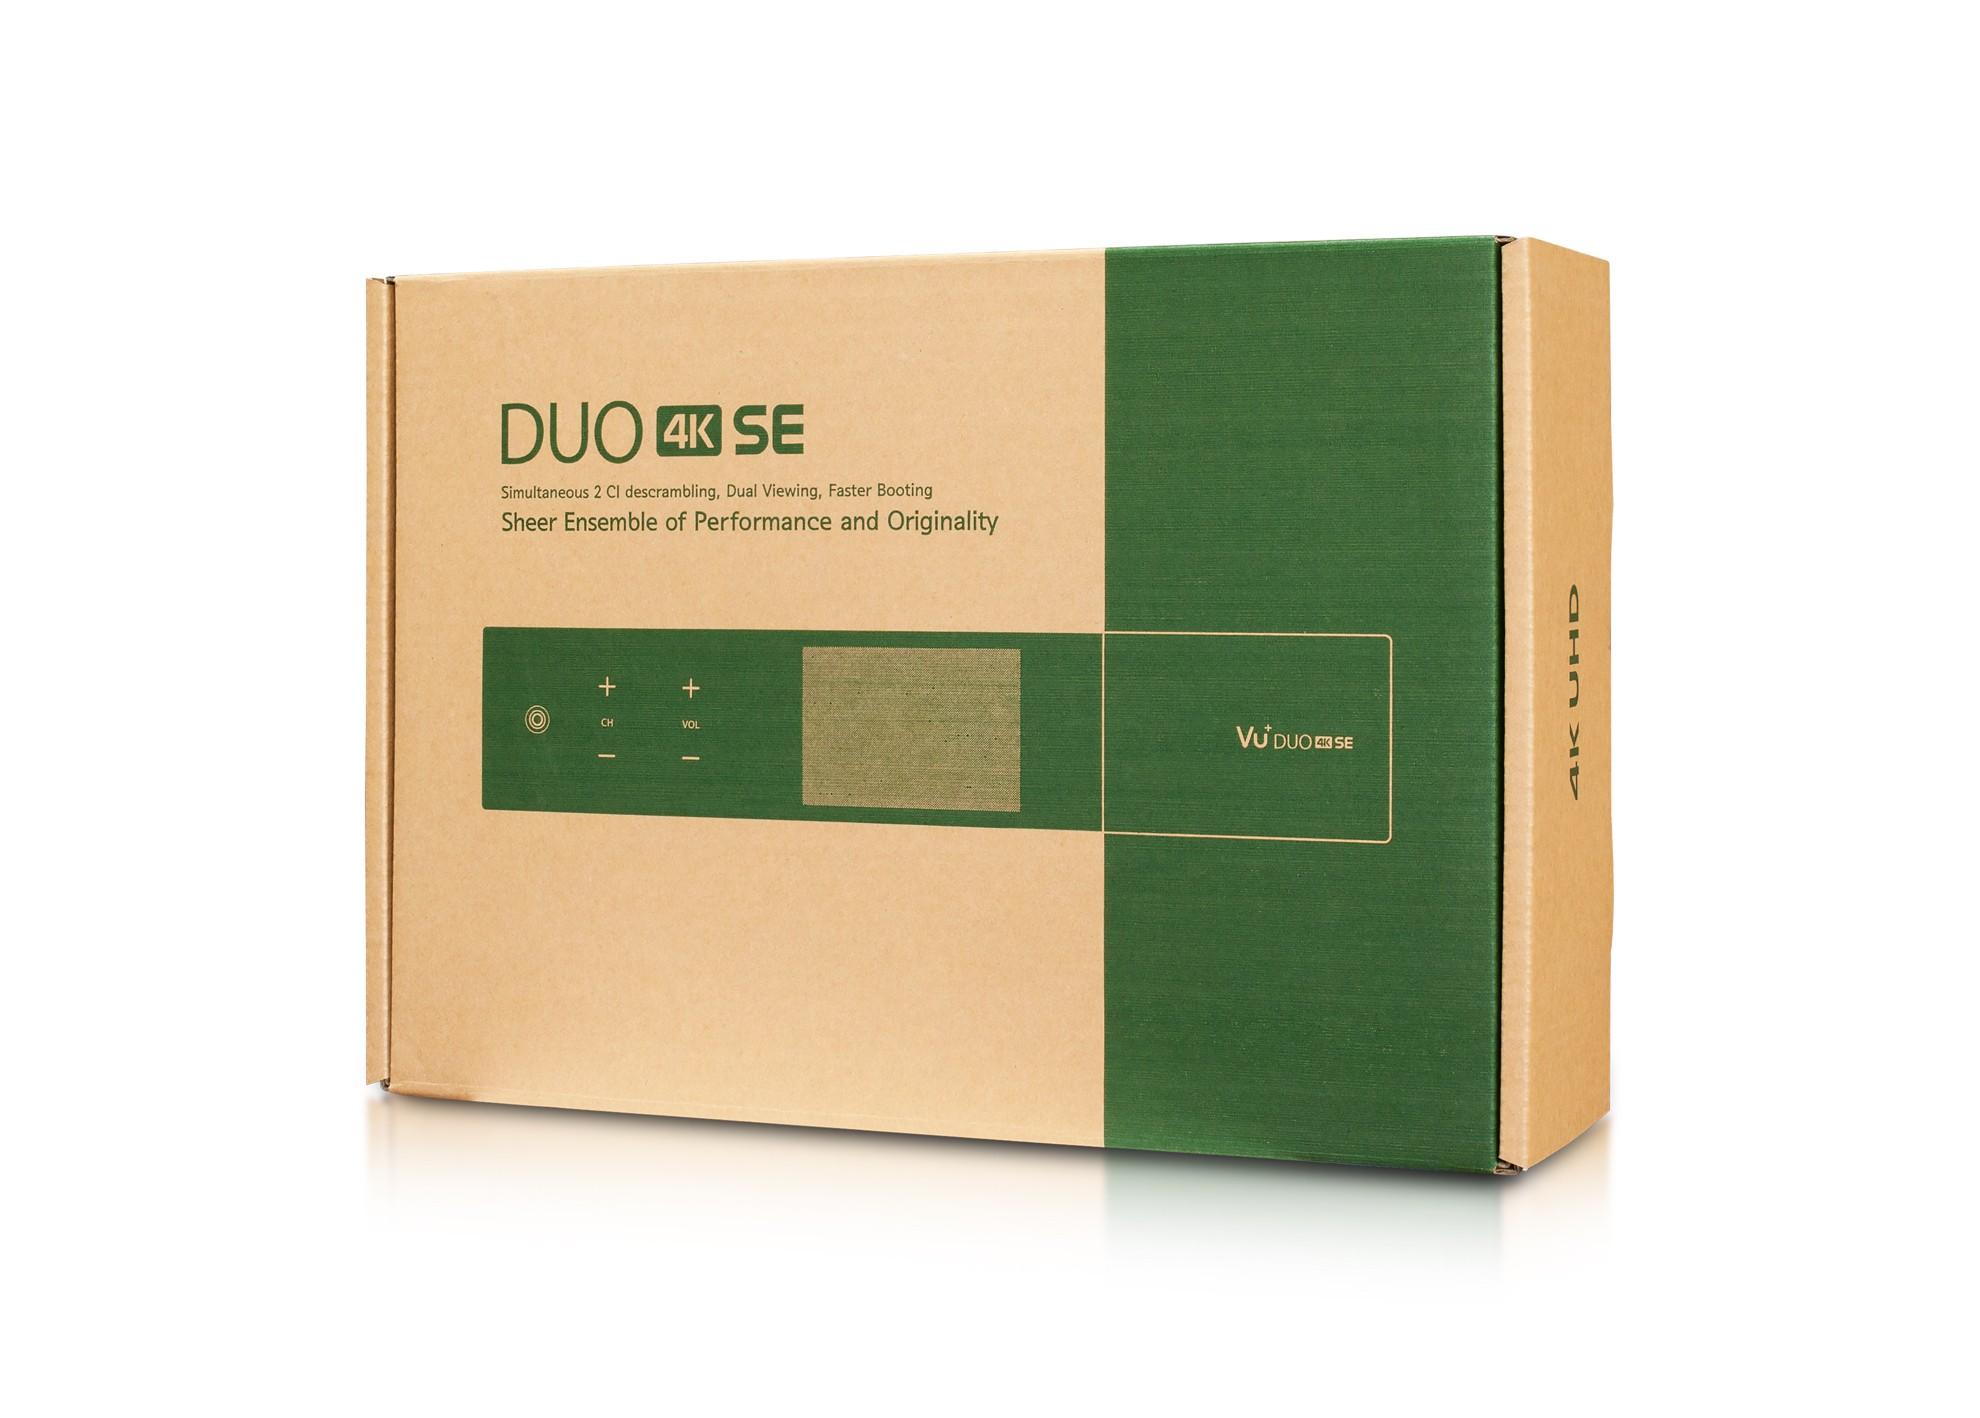 VU+ DUO 4K SE (1x FBC C tuner)